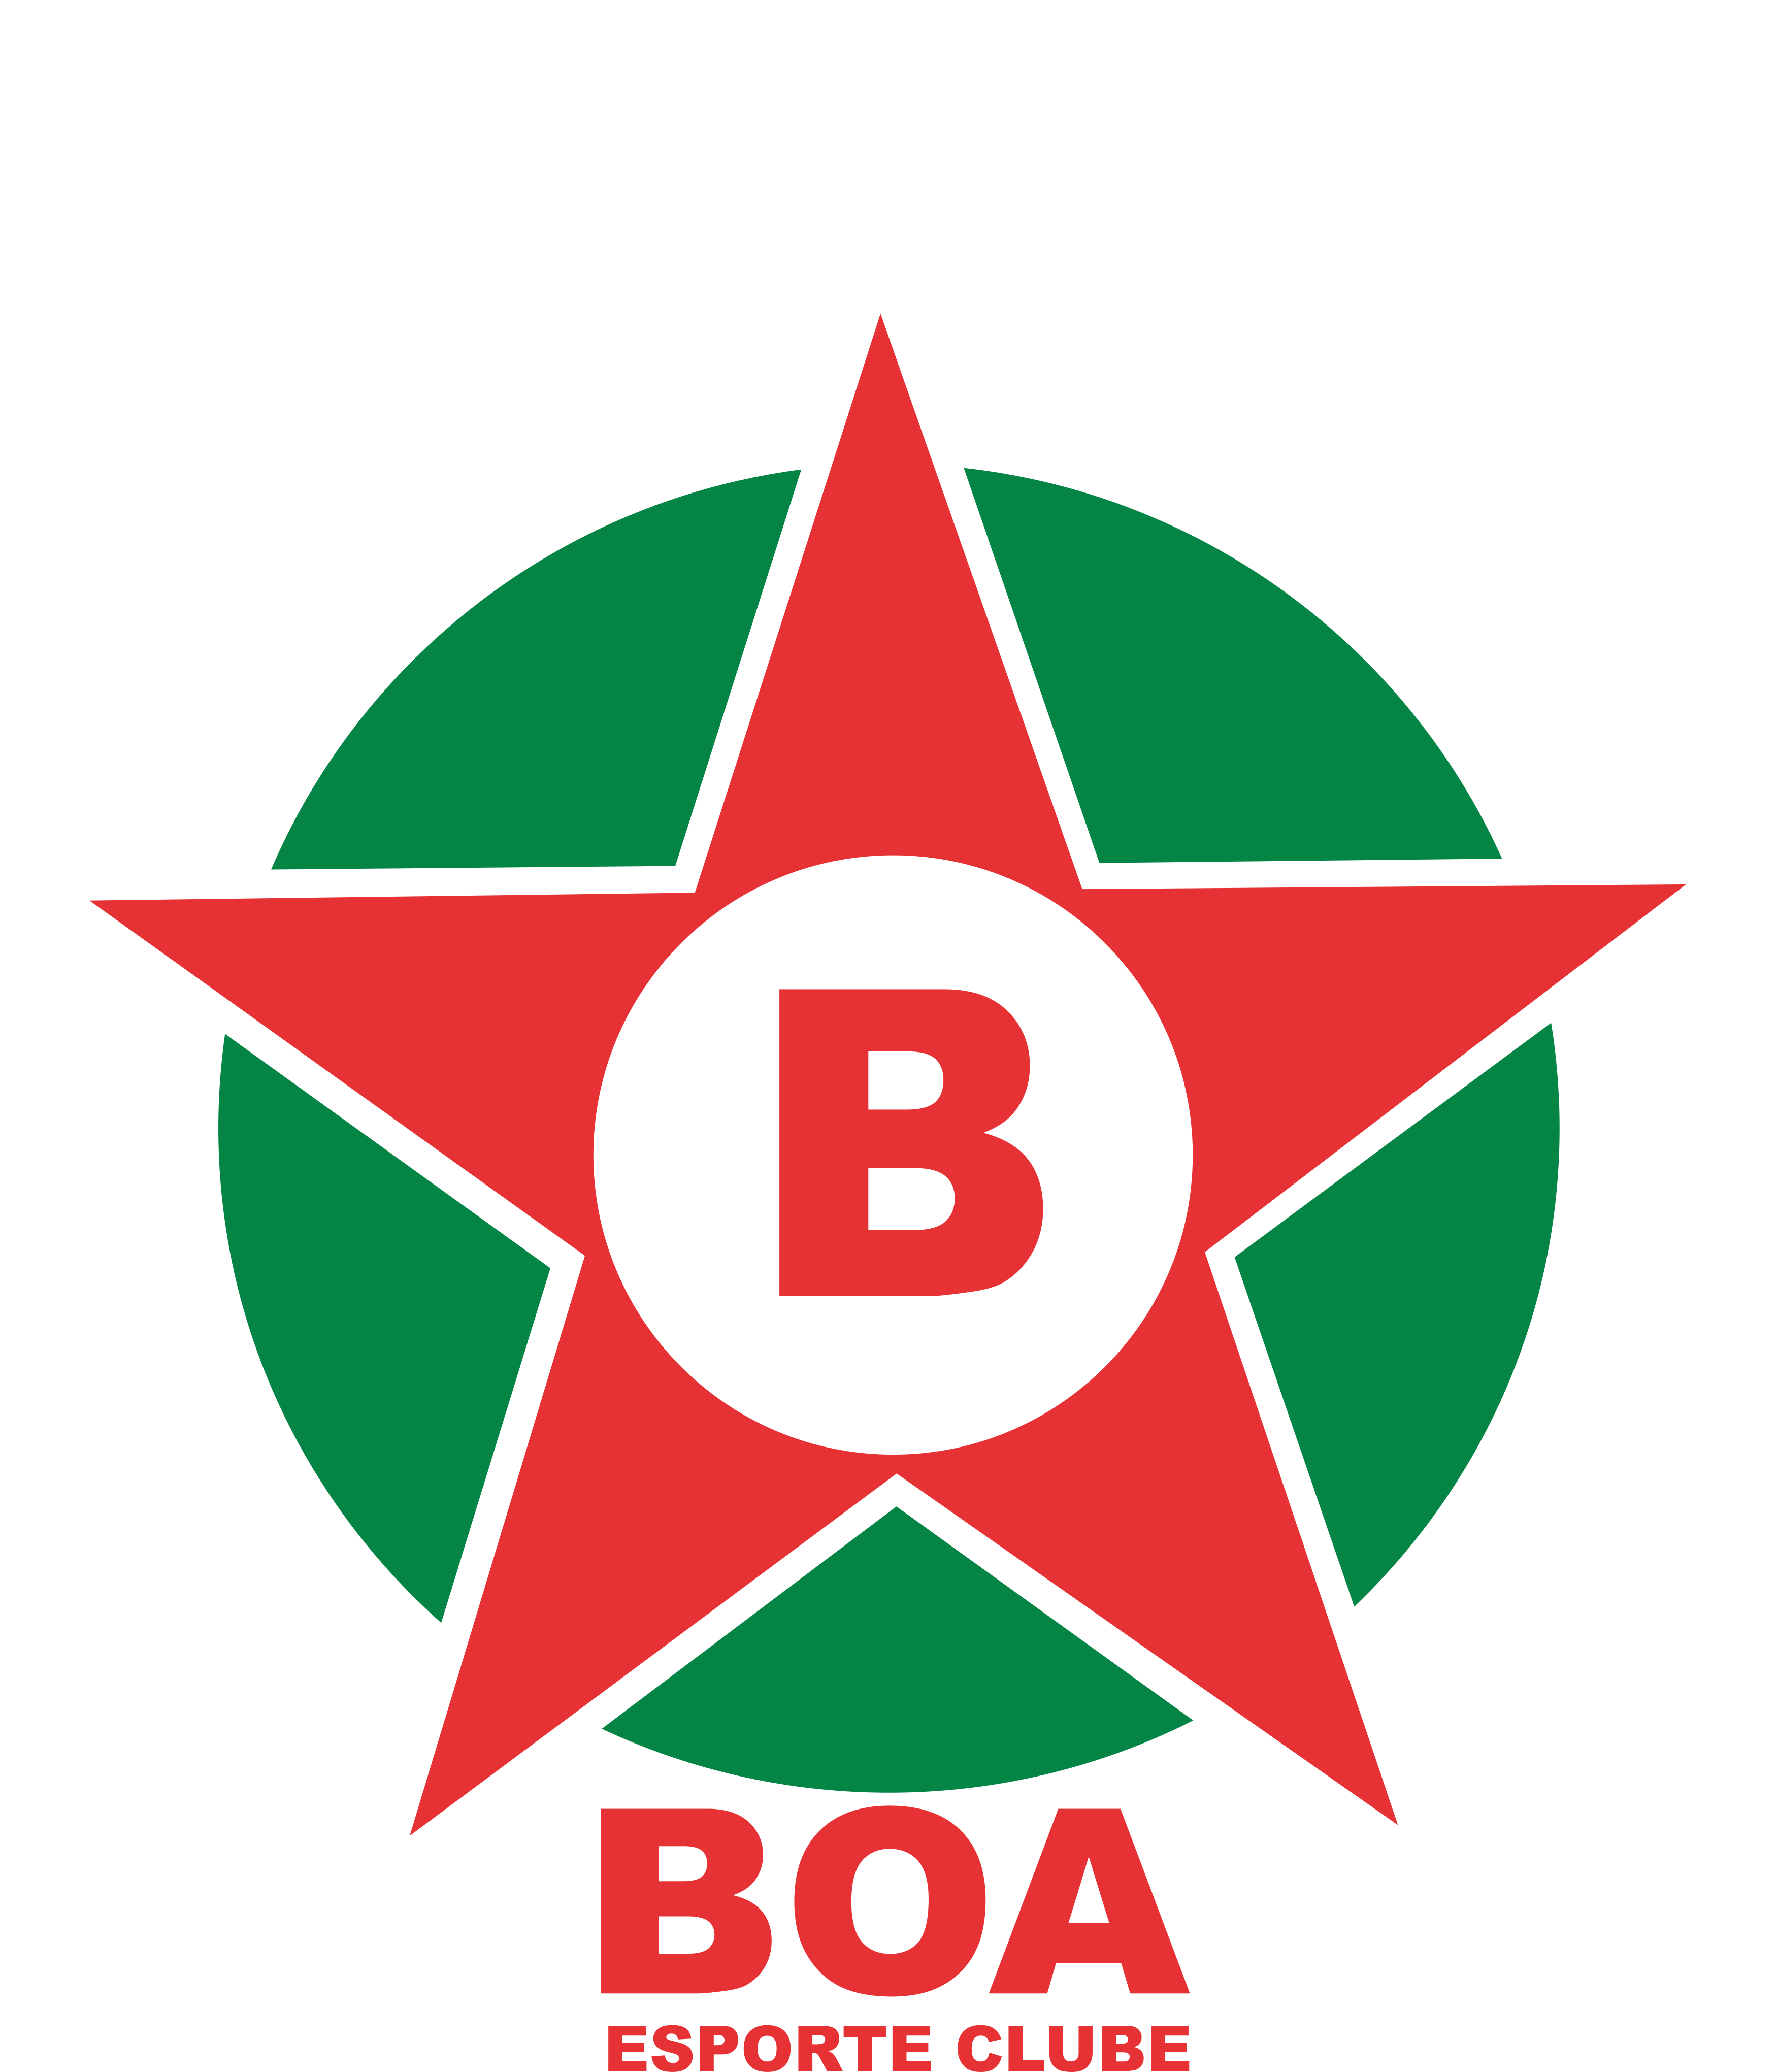 Boa Esporte Clube Logo, Escudo.